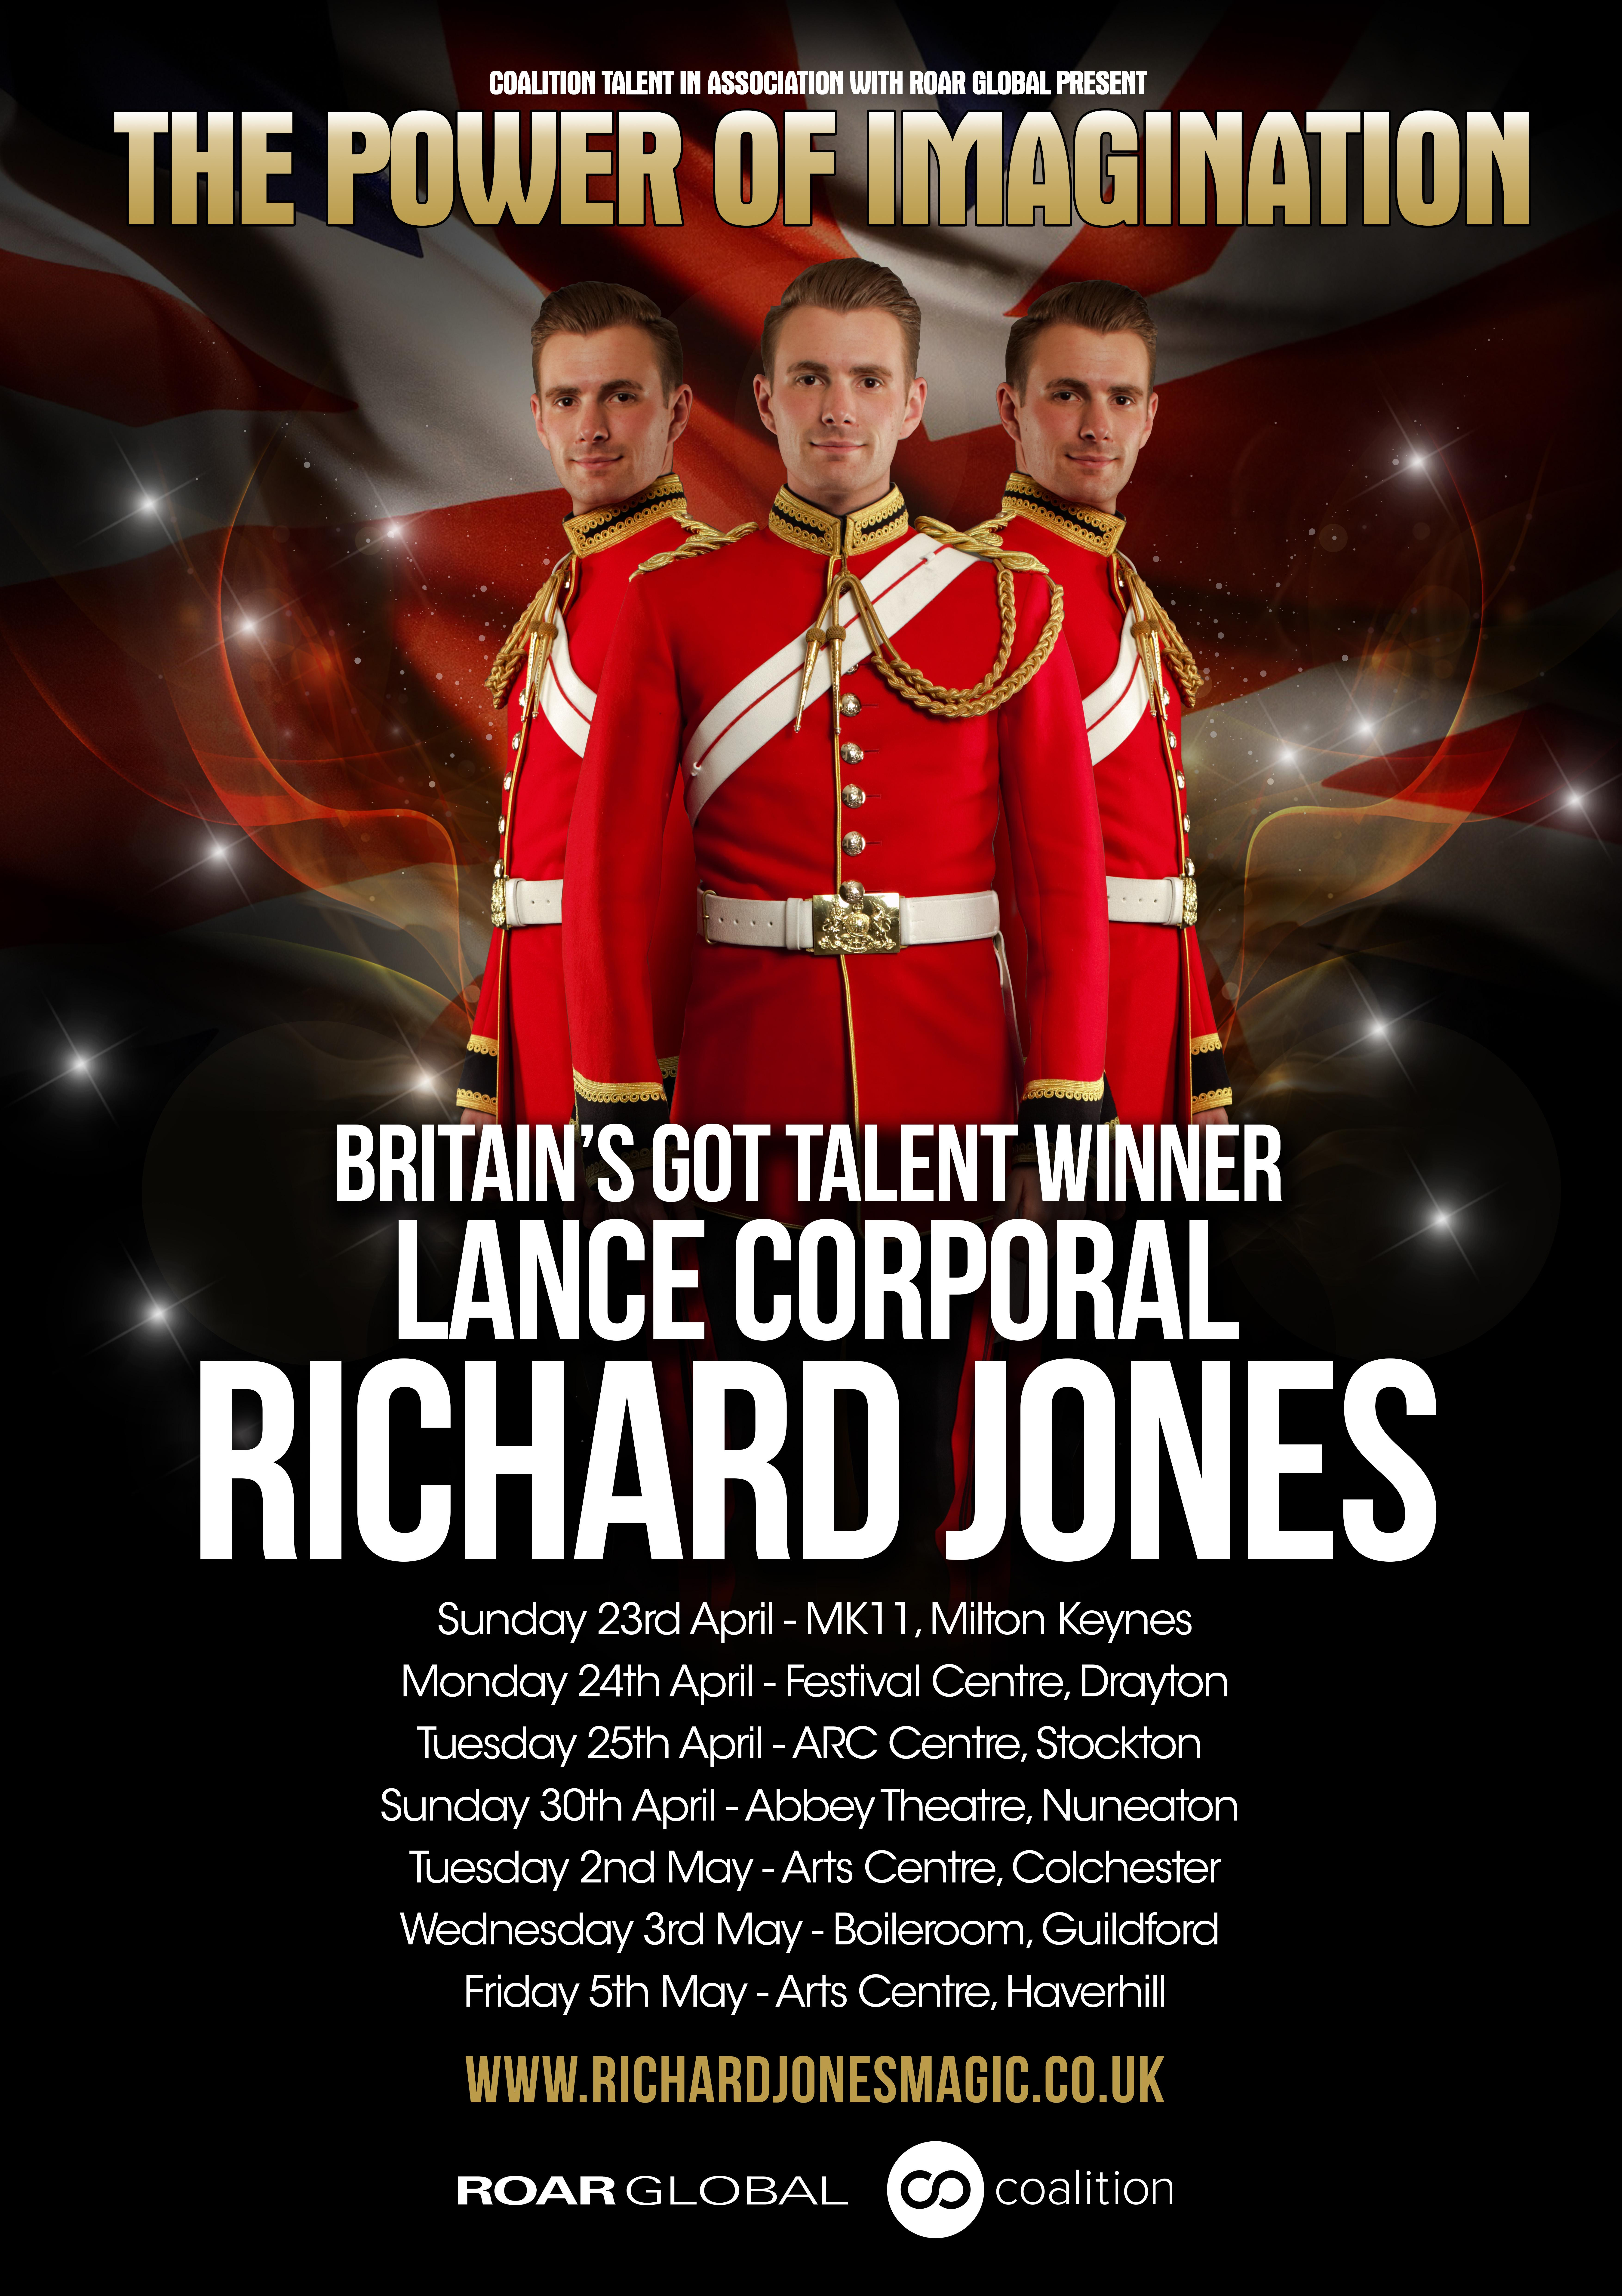 Lance Corporal Richard Jones